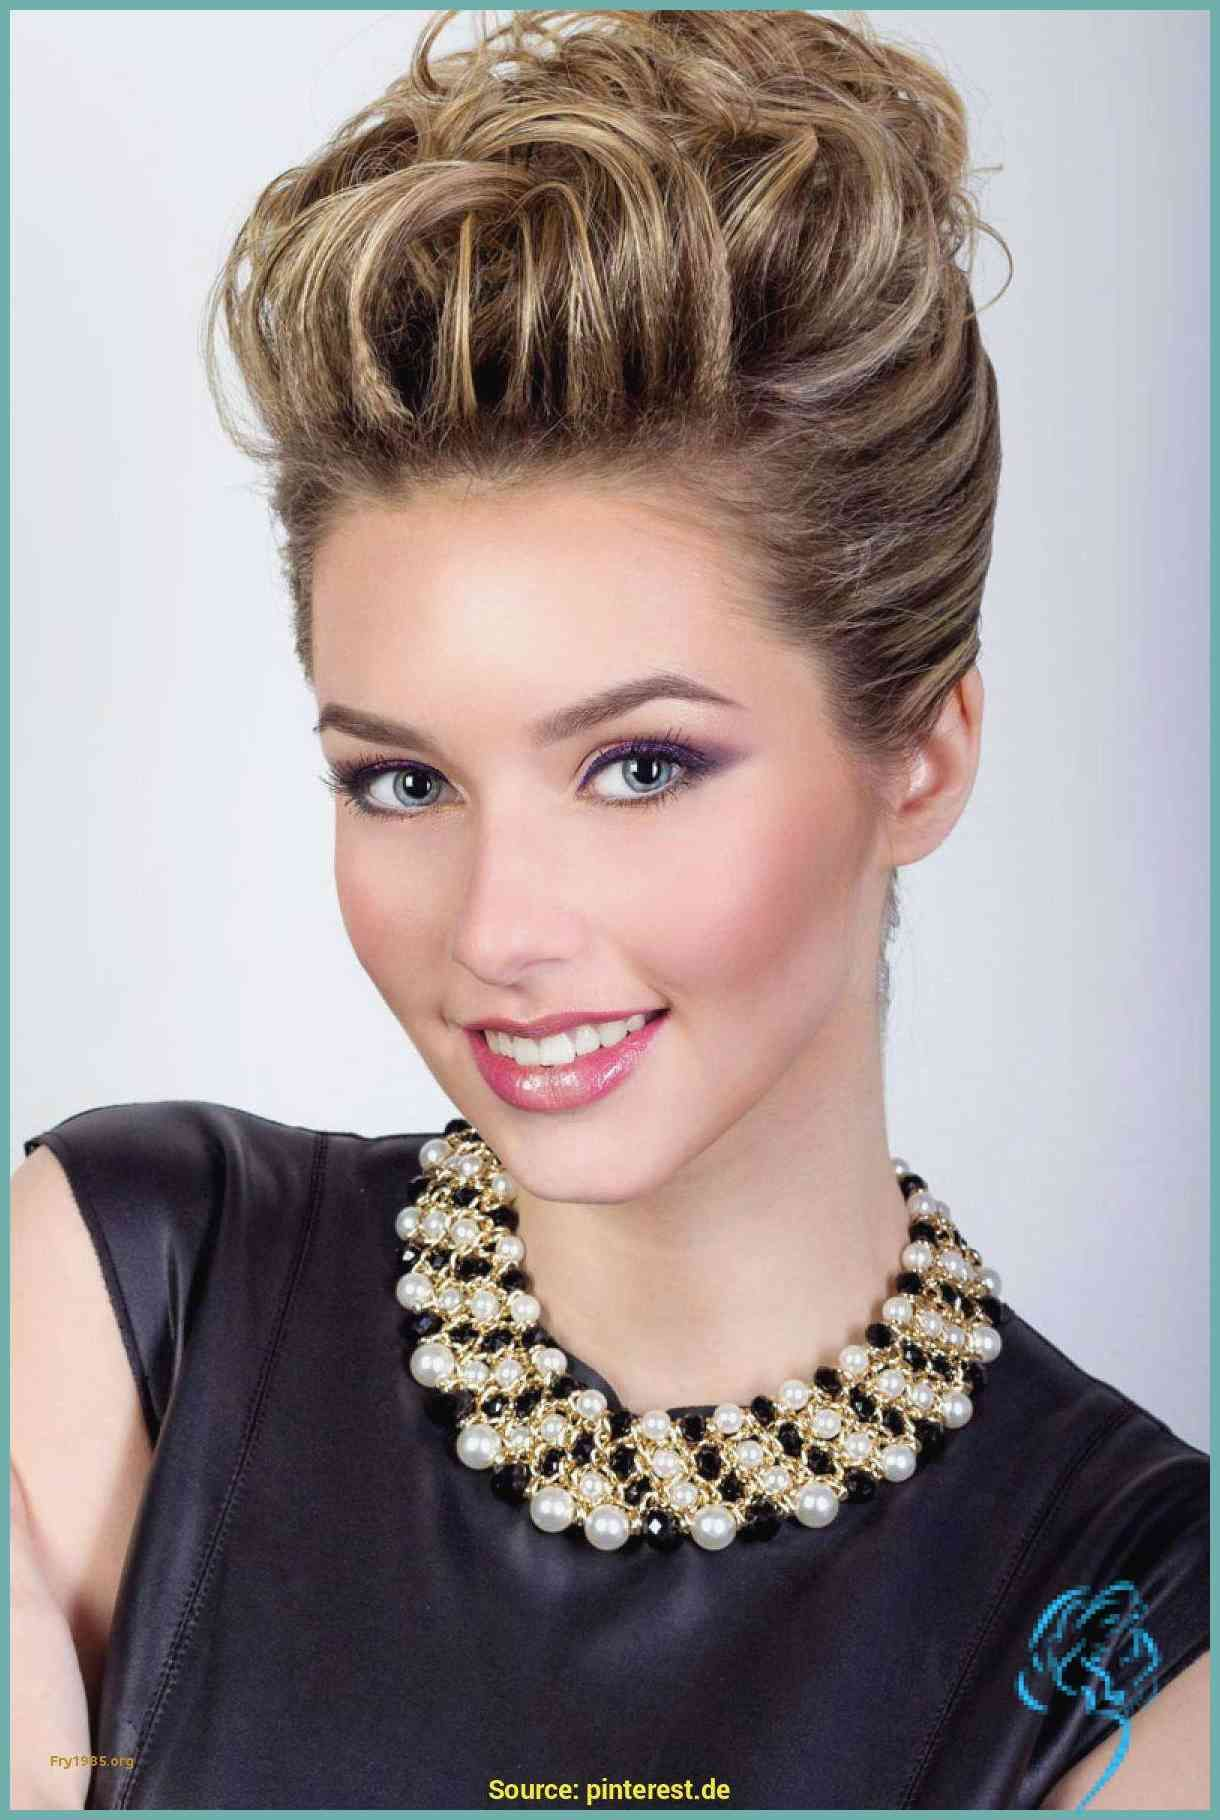 Am Besten Frisuren Die Alter Machen Beste Modetrends Damen Frisuren Fasce Per Capelli Acconciatura Corta Idee Per Acconciature